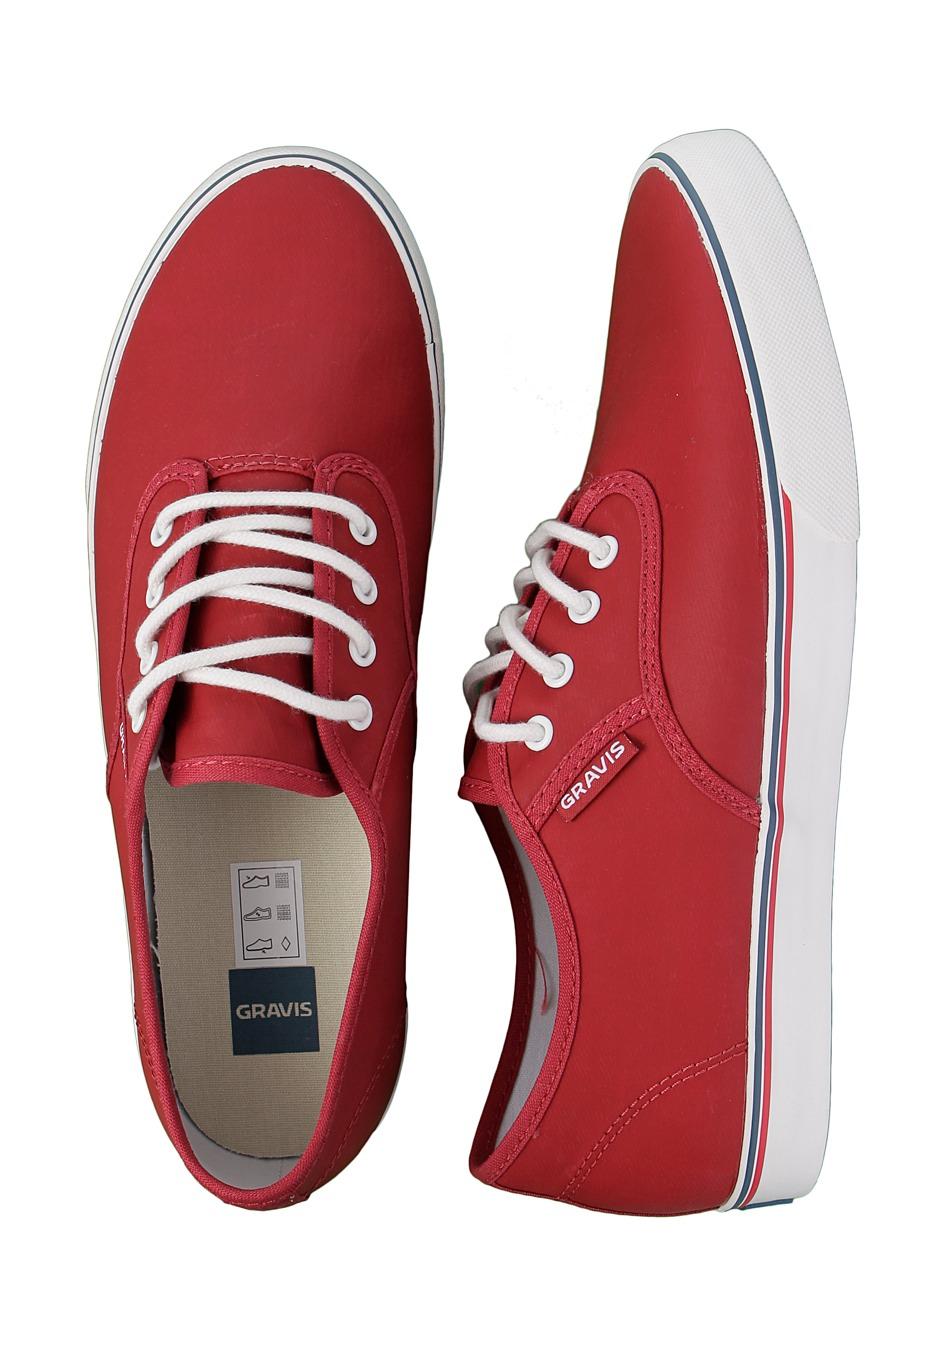 9bbe94dd84e7 Gravis - Slymz Red Wax - Shoes - Impericon.com US